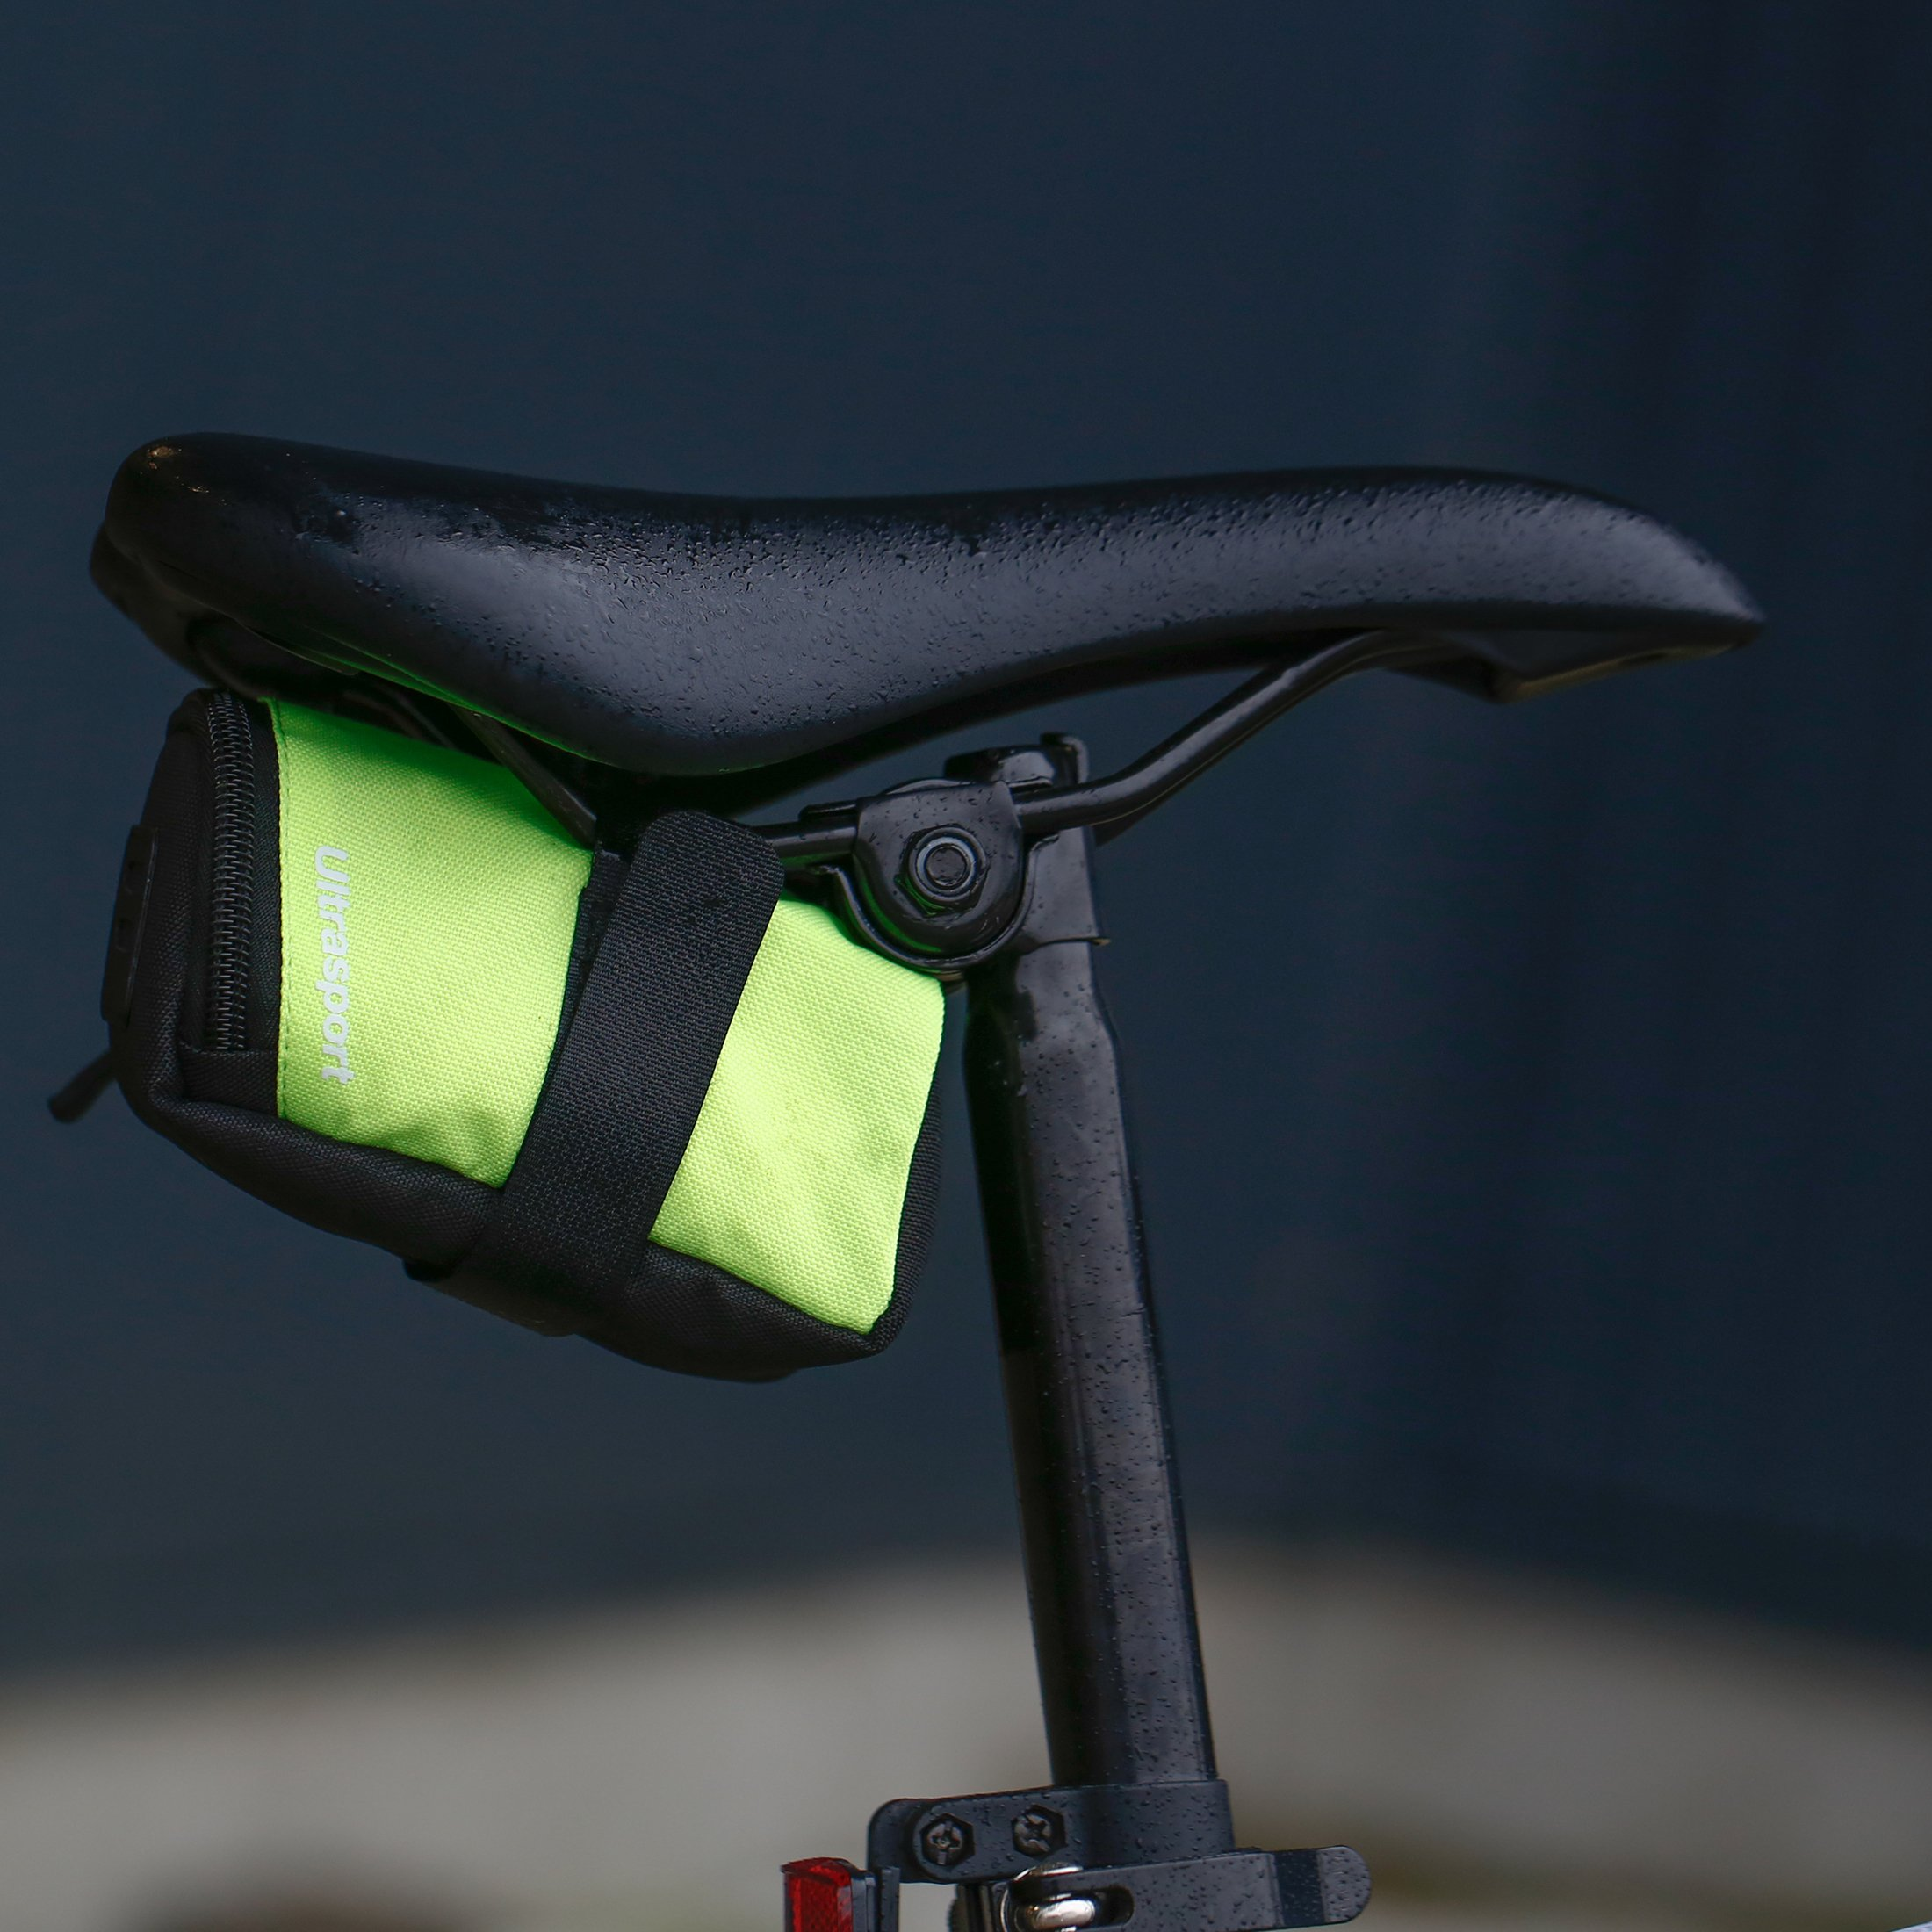 Ultrasport Alforja para bicicleta, 0,5 l de capacidad, p. ej. para ...